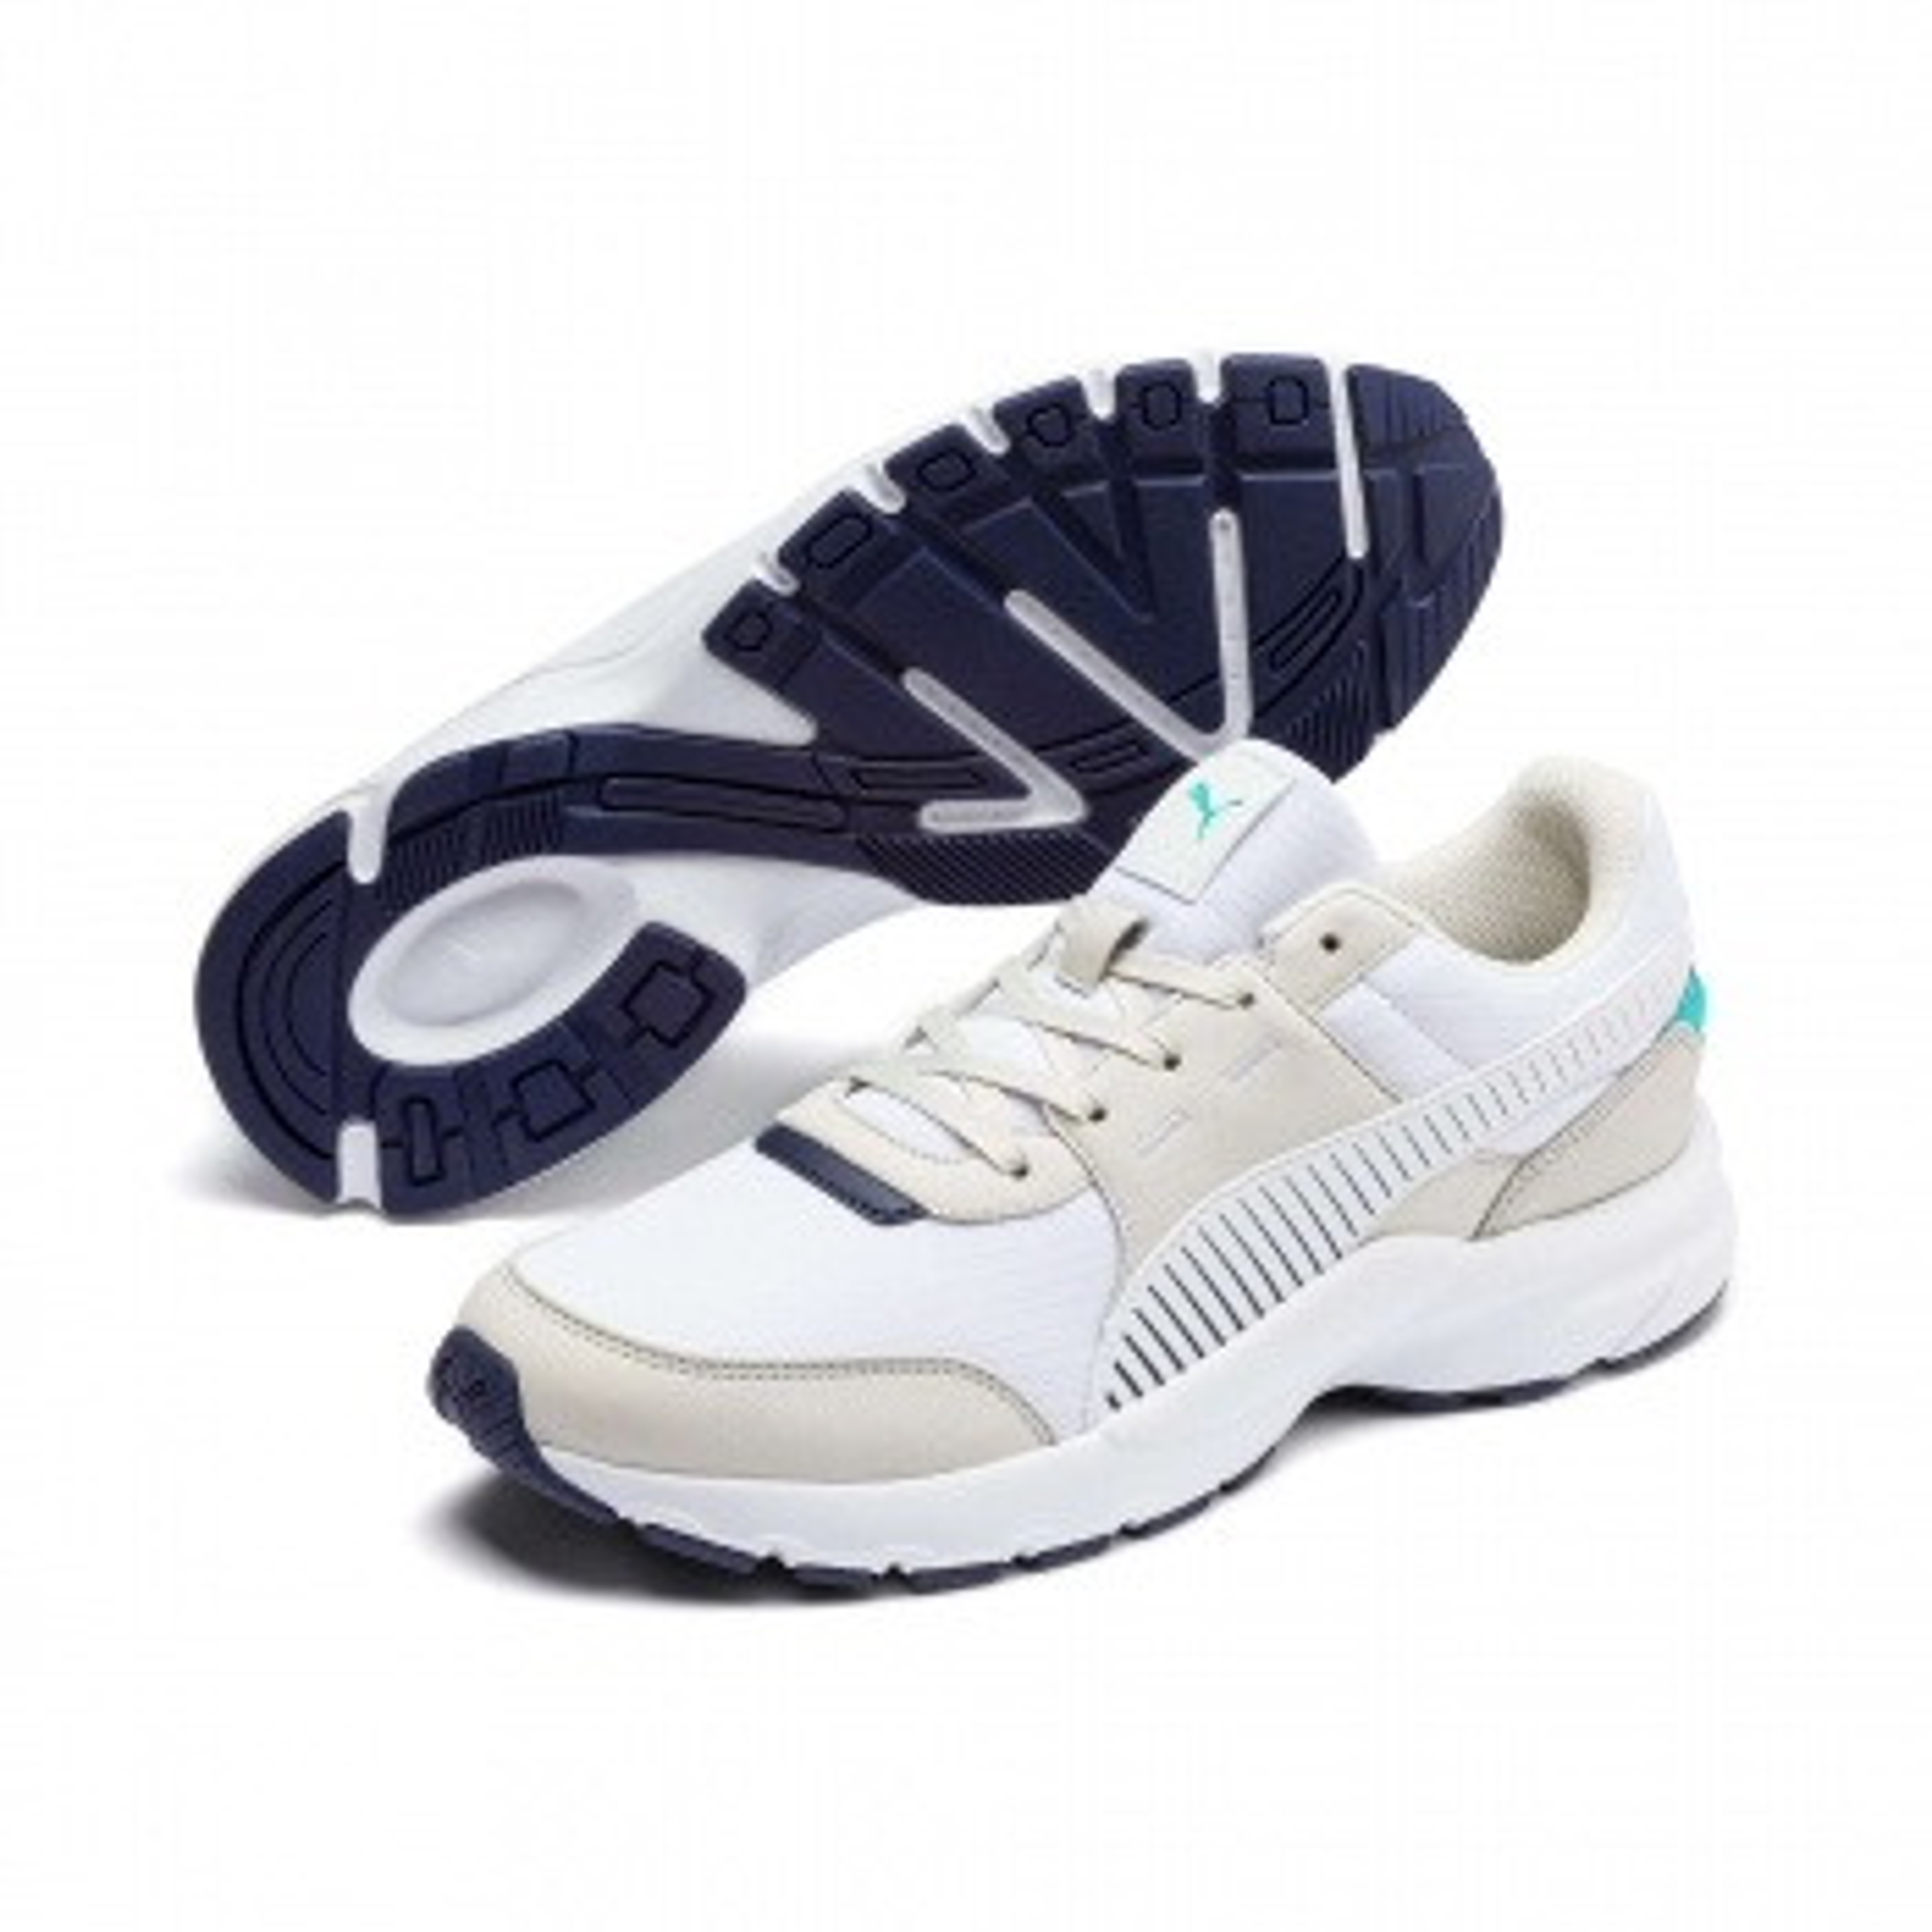 Puma Future Runner Erkek Ayakkabısı